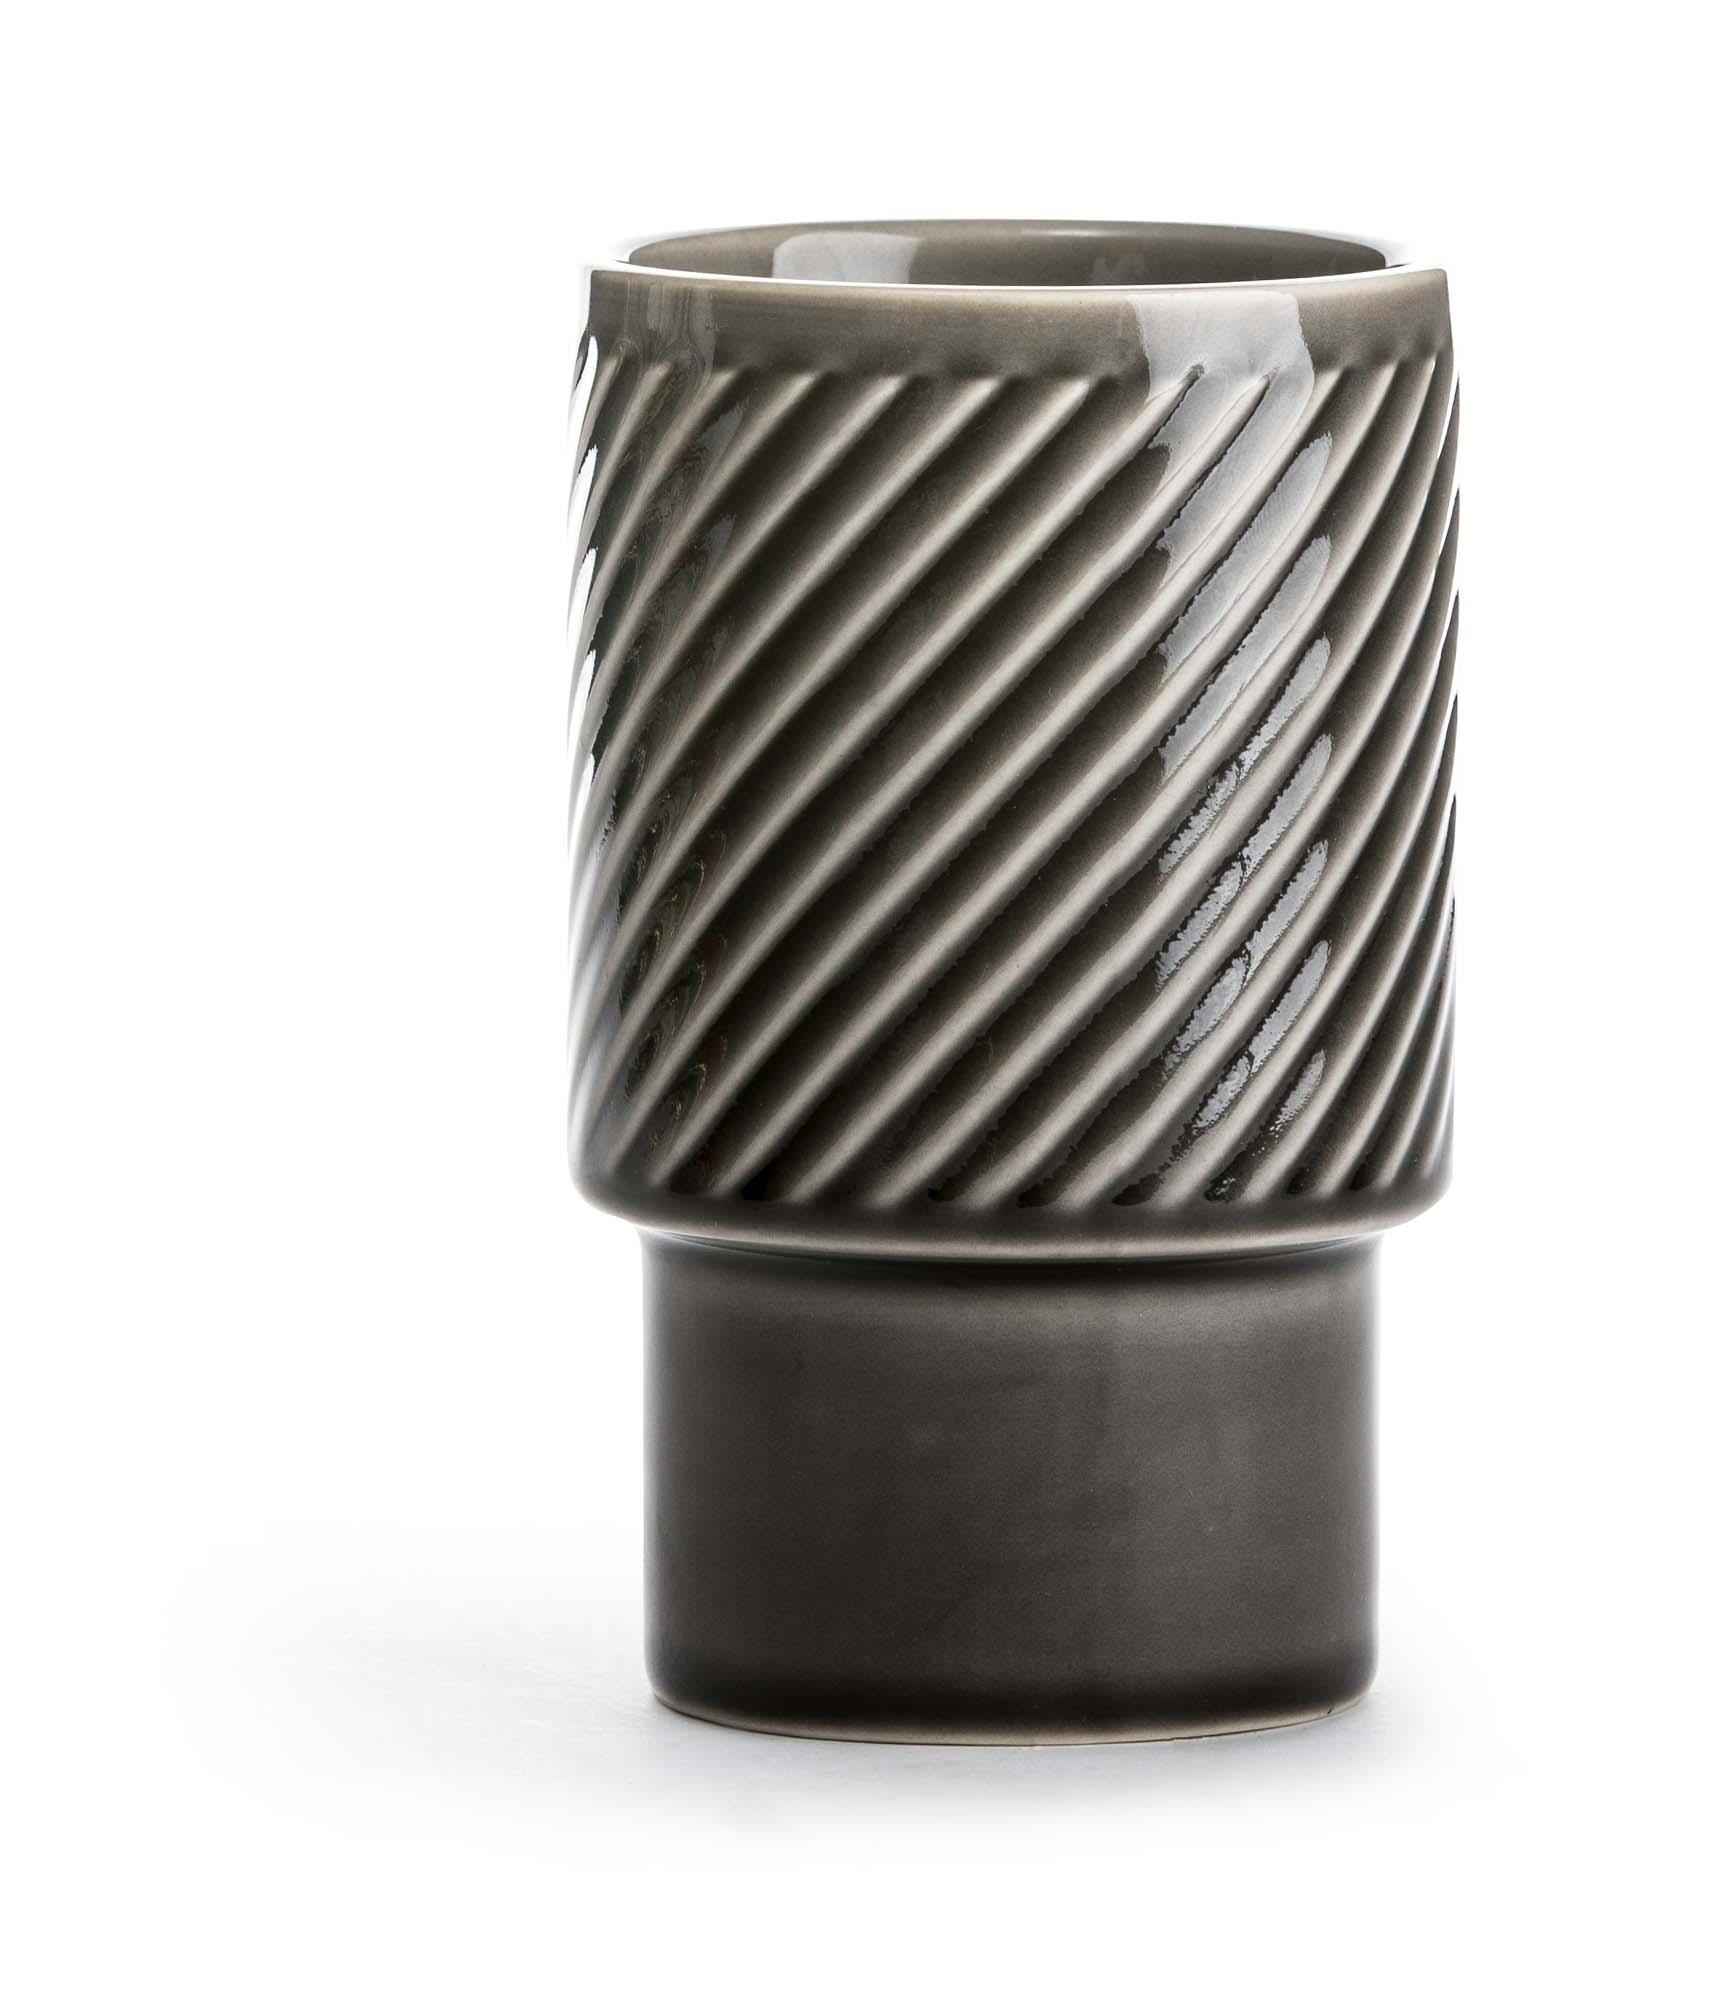 Sagaform Coffee & More lattekrus grå